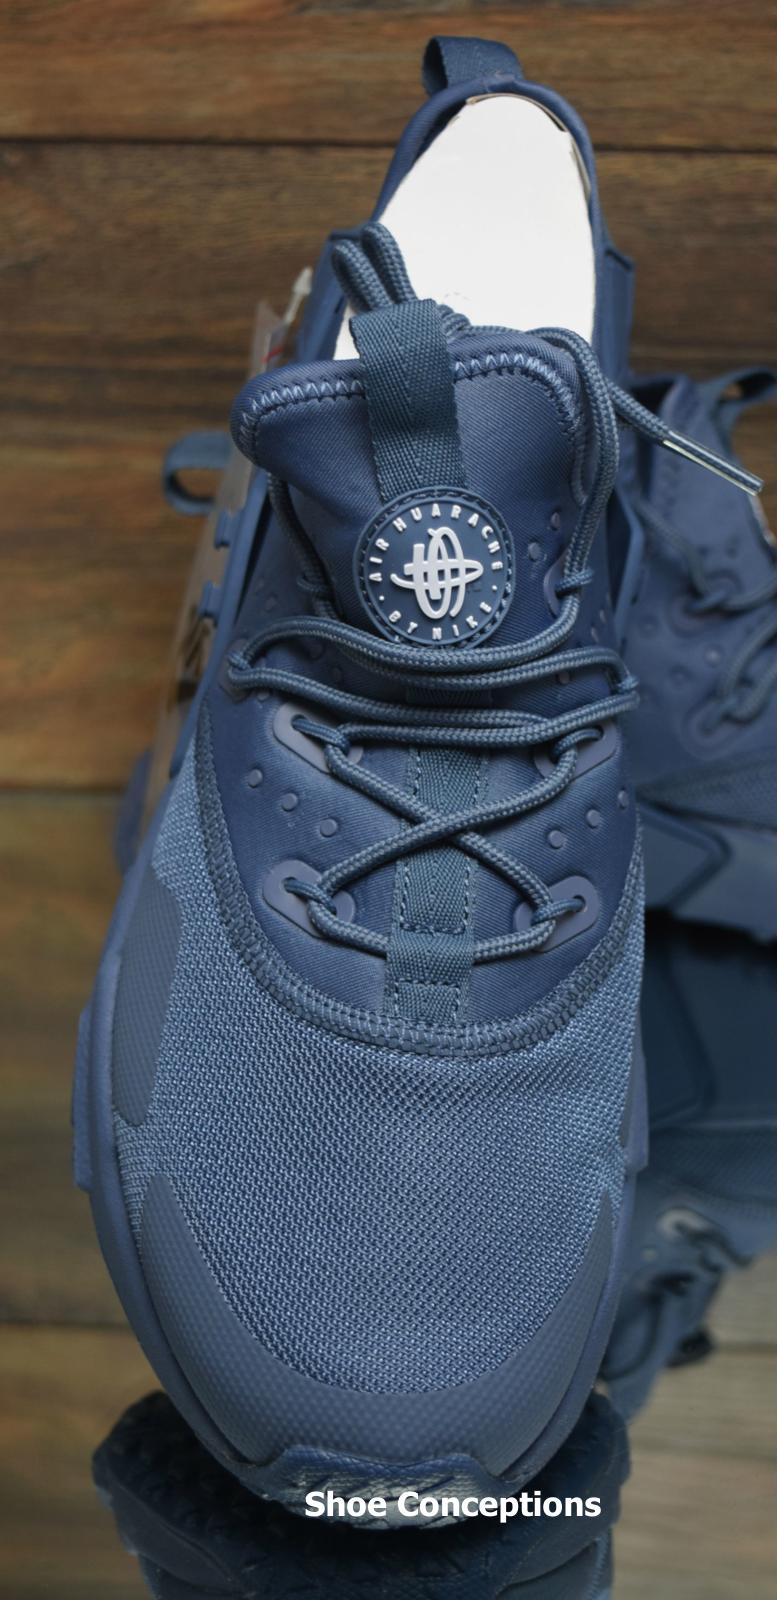 267572bd8a16 ... Nike Air Huarache Drift Diff Blue AH7334-400 Men s Shoes Multi Multi  Multi Size f78d50 ...